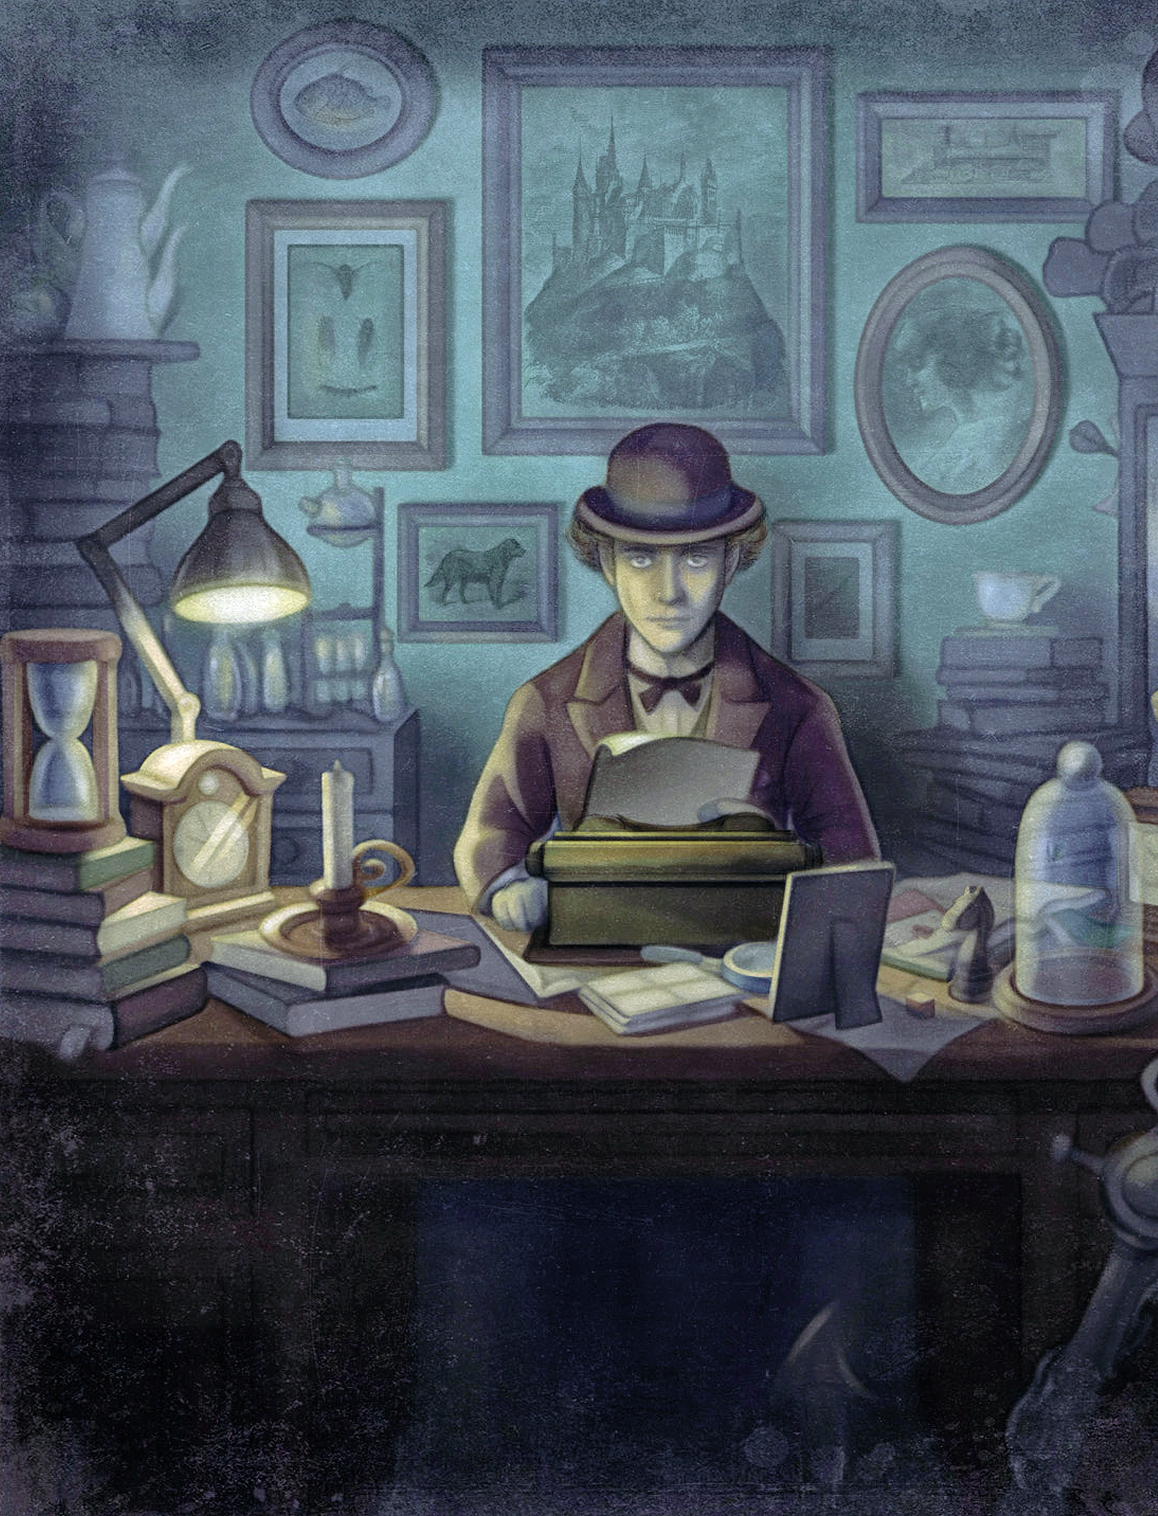 La nuova metamorfosi: Kafka si trasforma in un videogame ne«la Lettura» in edicola